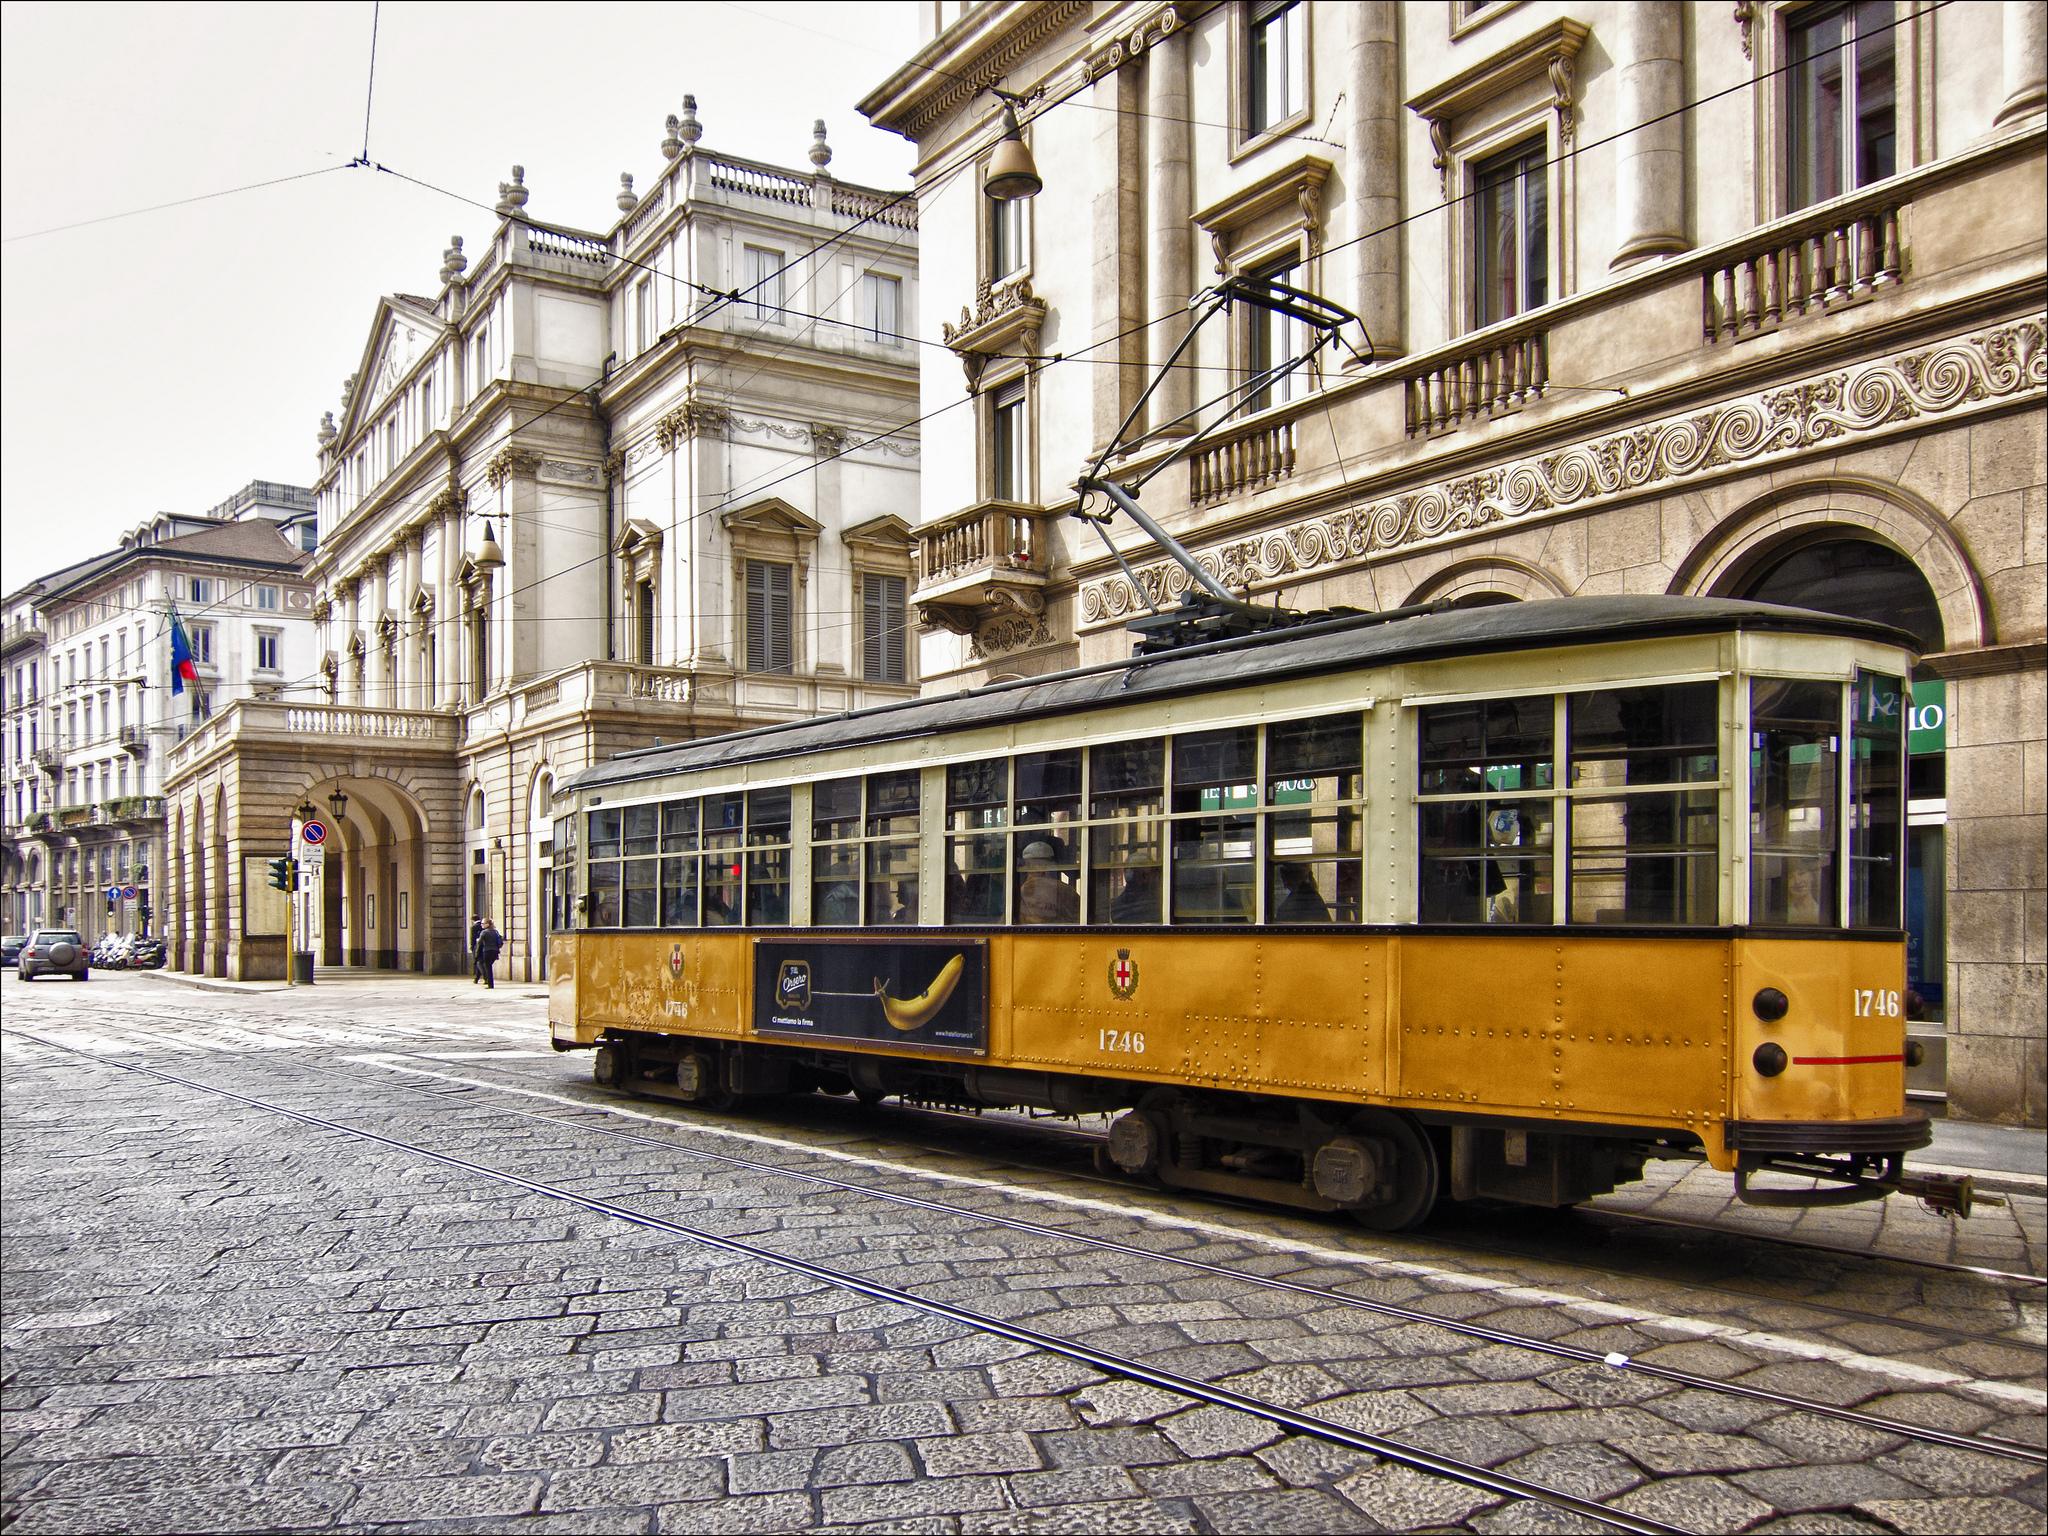 Travel by tram